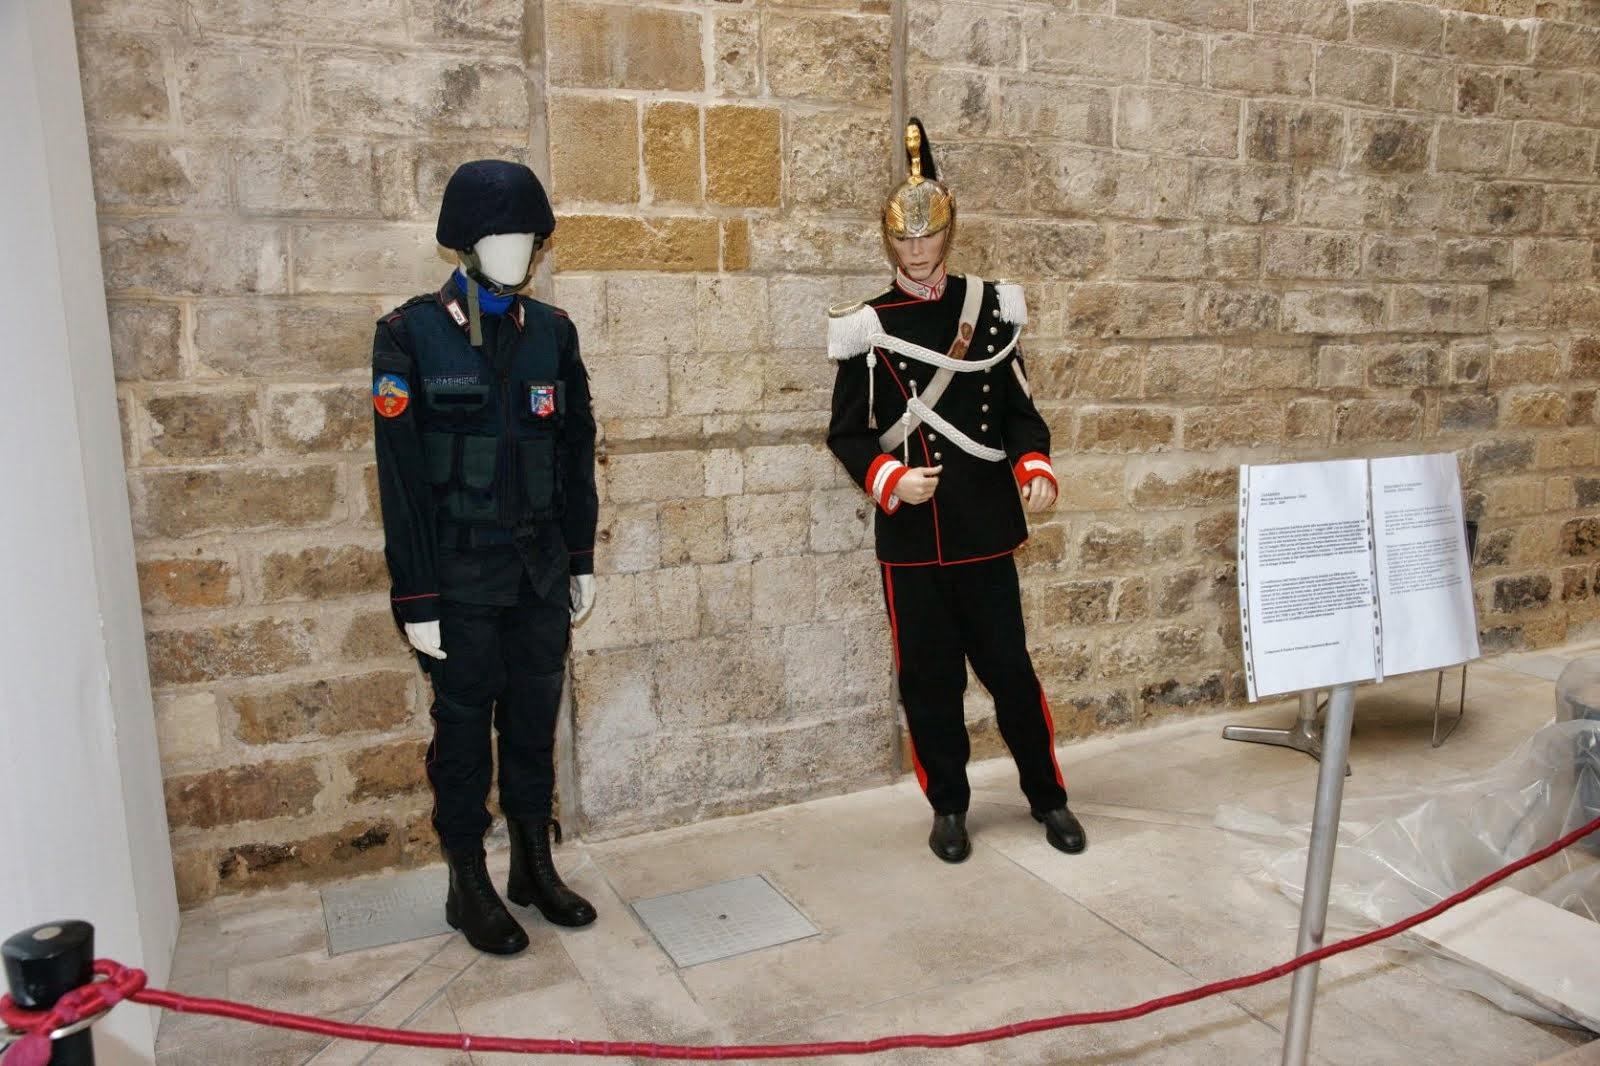 Mostra dei carabinieri a Bari